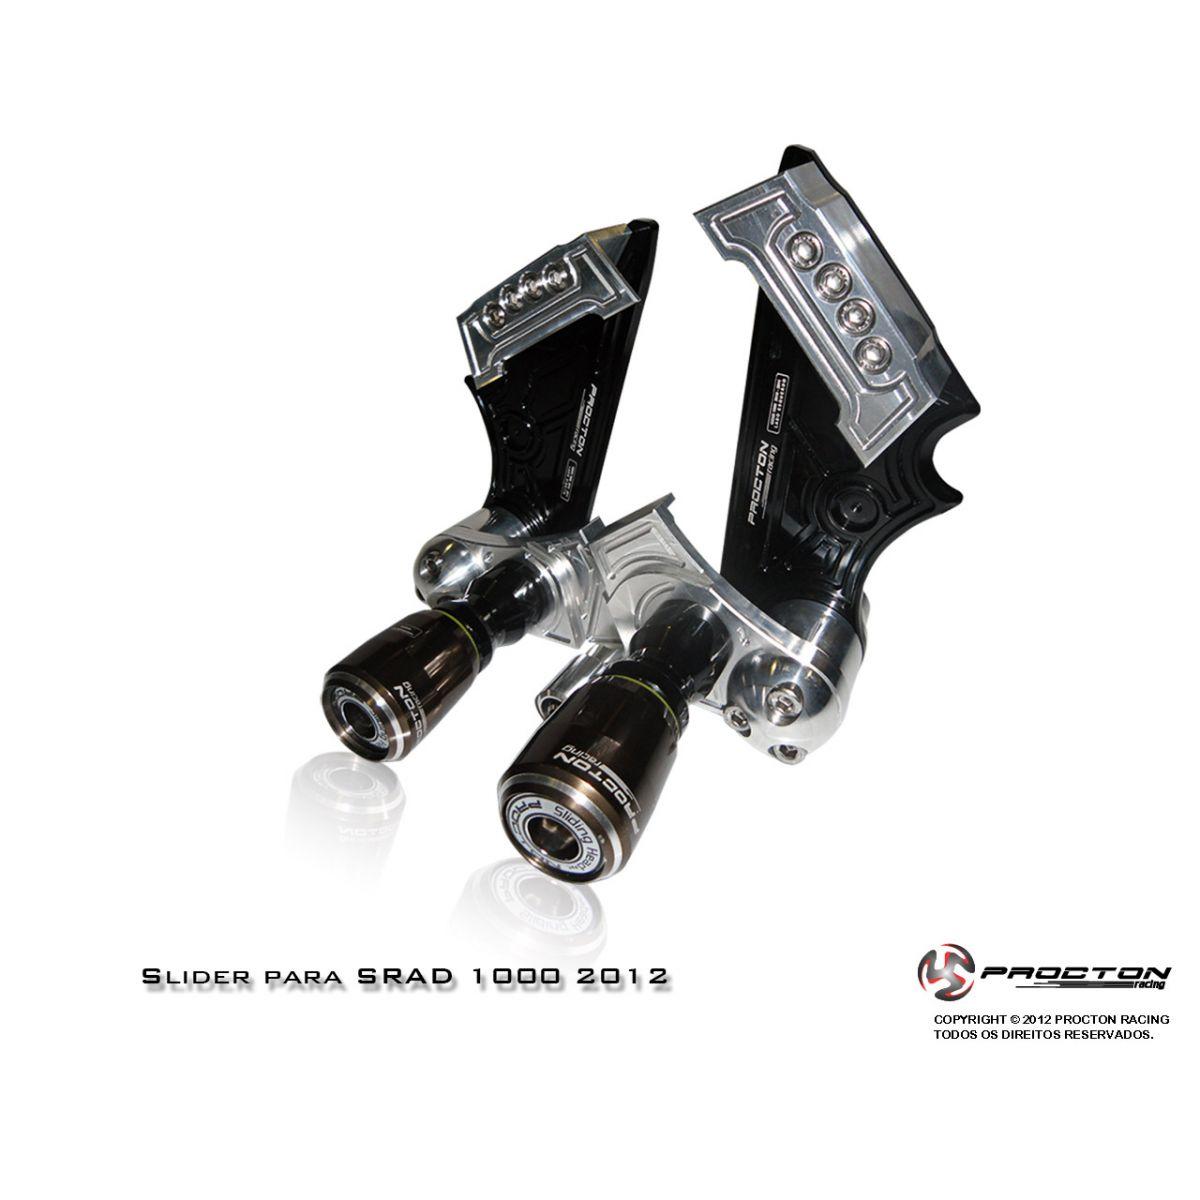 Slider Procton com Amortecimento Suzuki Srad1000 - 11/17